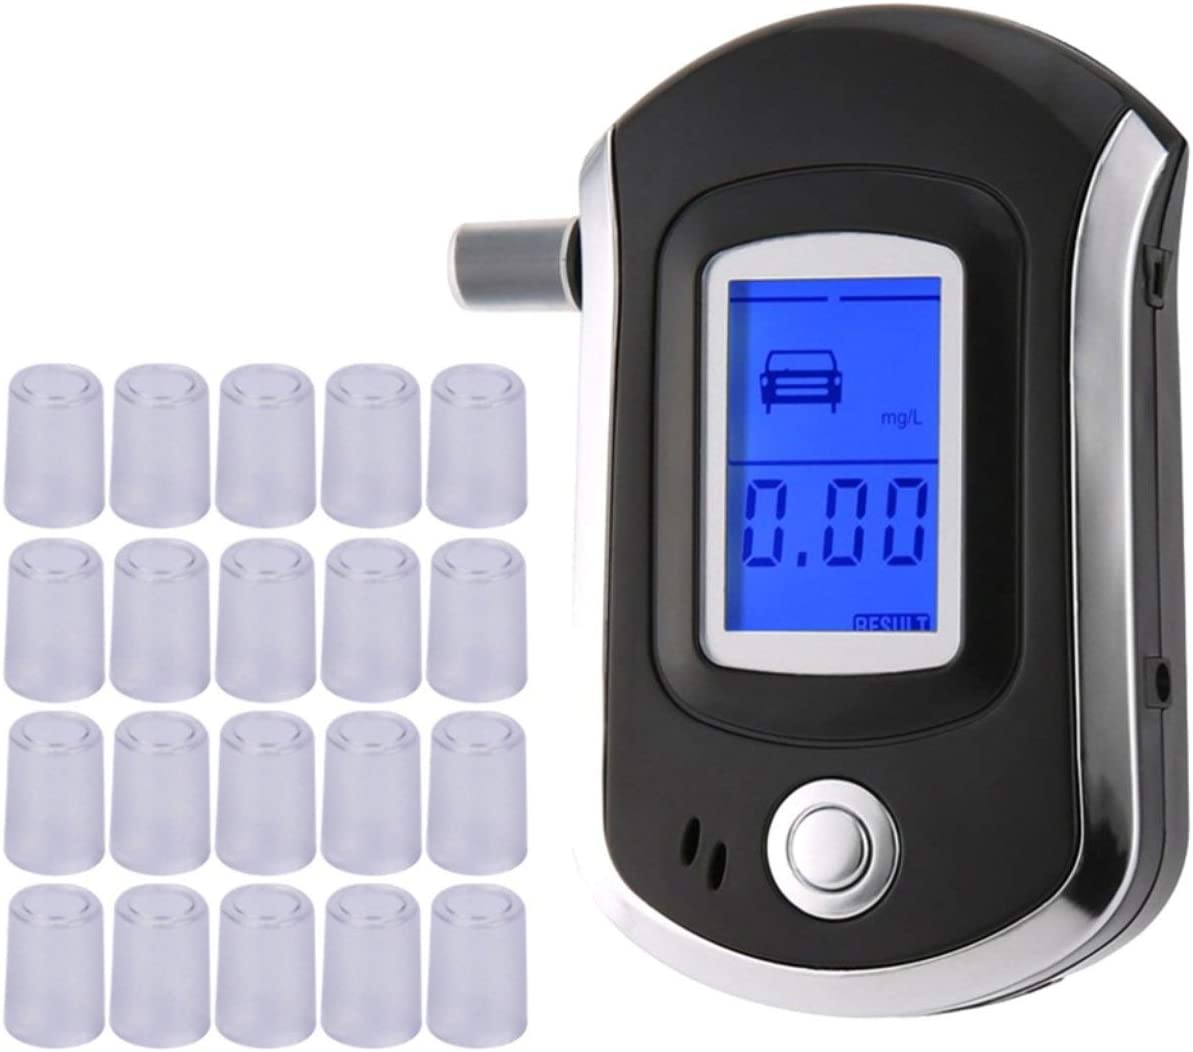 Boquillas para Aliento Alcohol Tester Alcohol/ímetro Boquillas de soplado de alcohol/ímetro Digital Boquillas Transparentes Jasnyfall